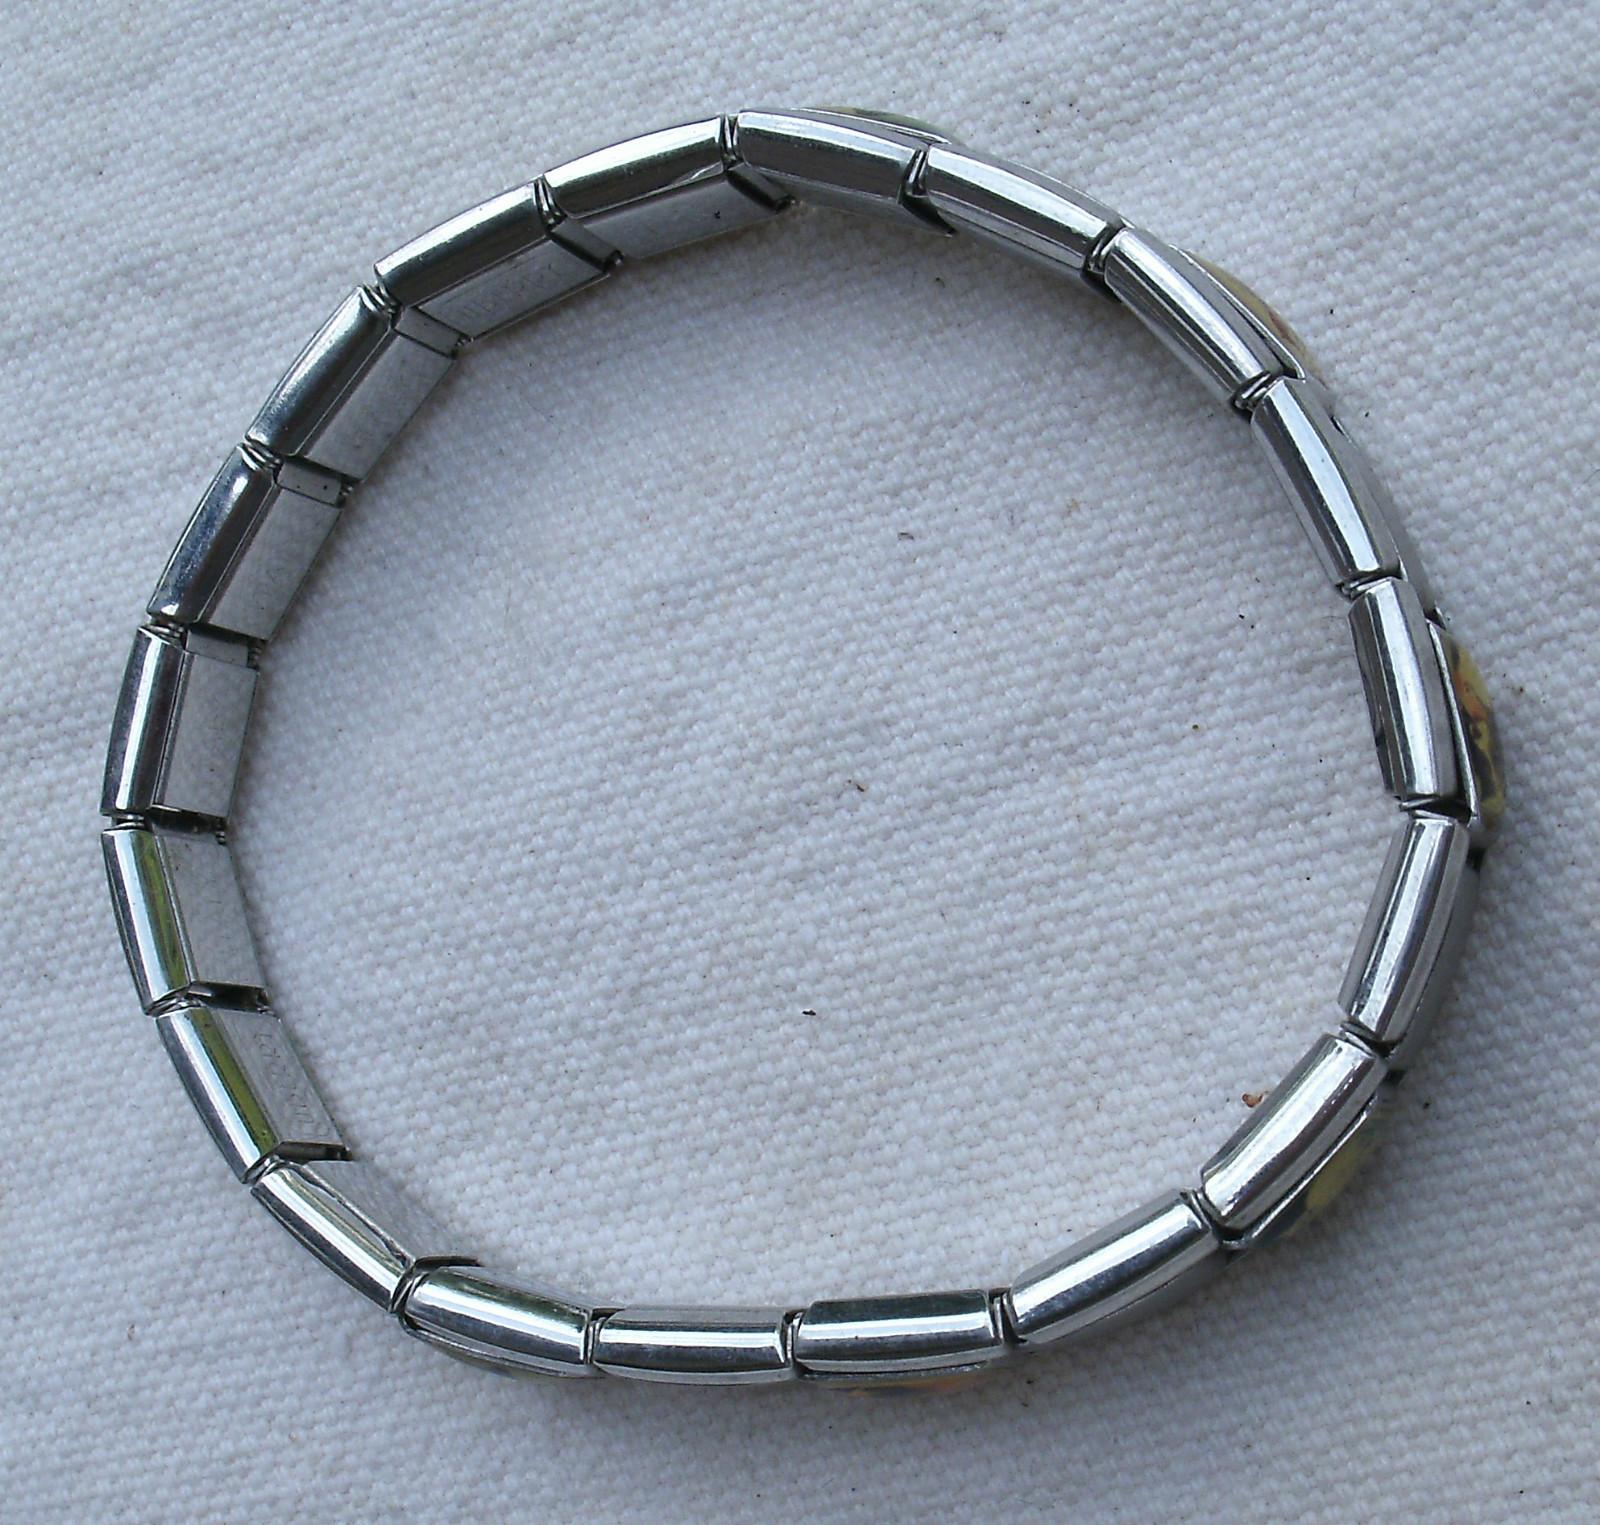 Italian Charm Bracelet Brands: Italian Charm Link Bracelet, Silver,stretchy,from 2000